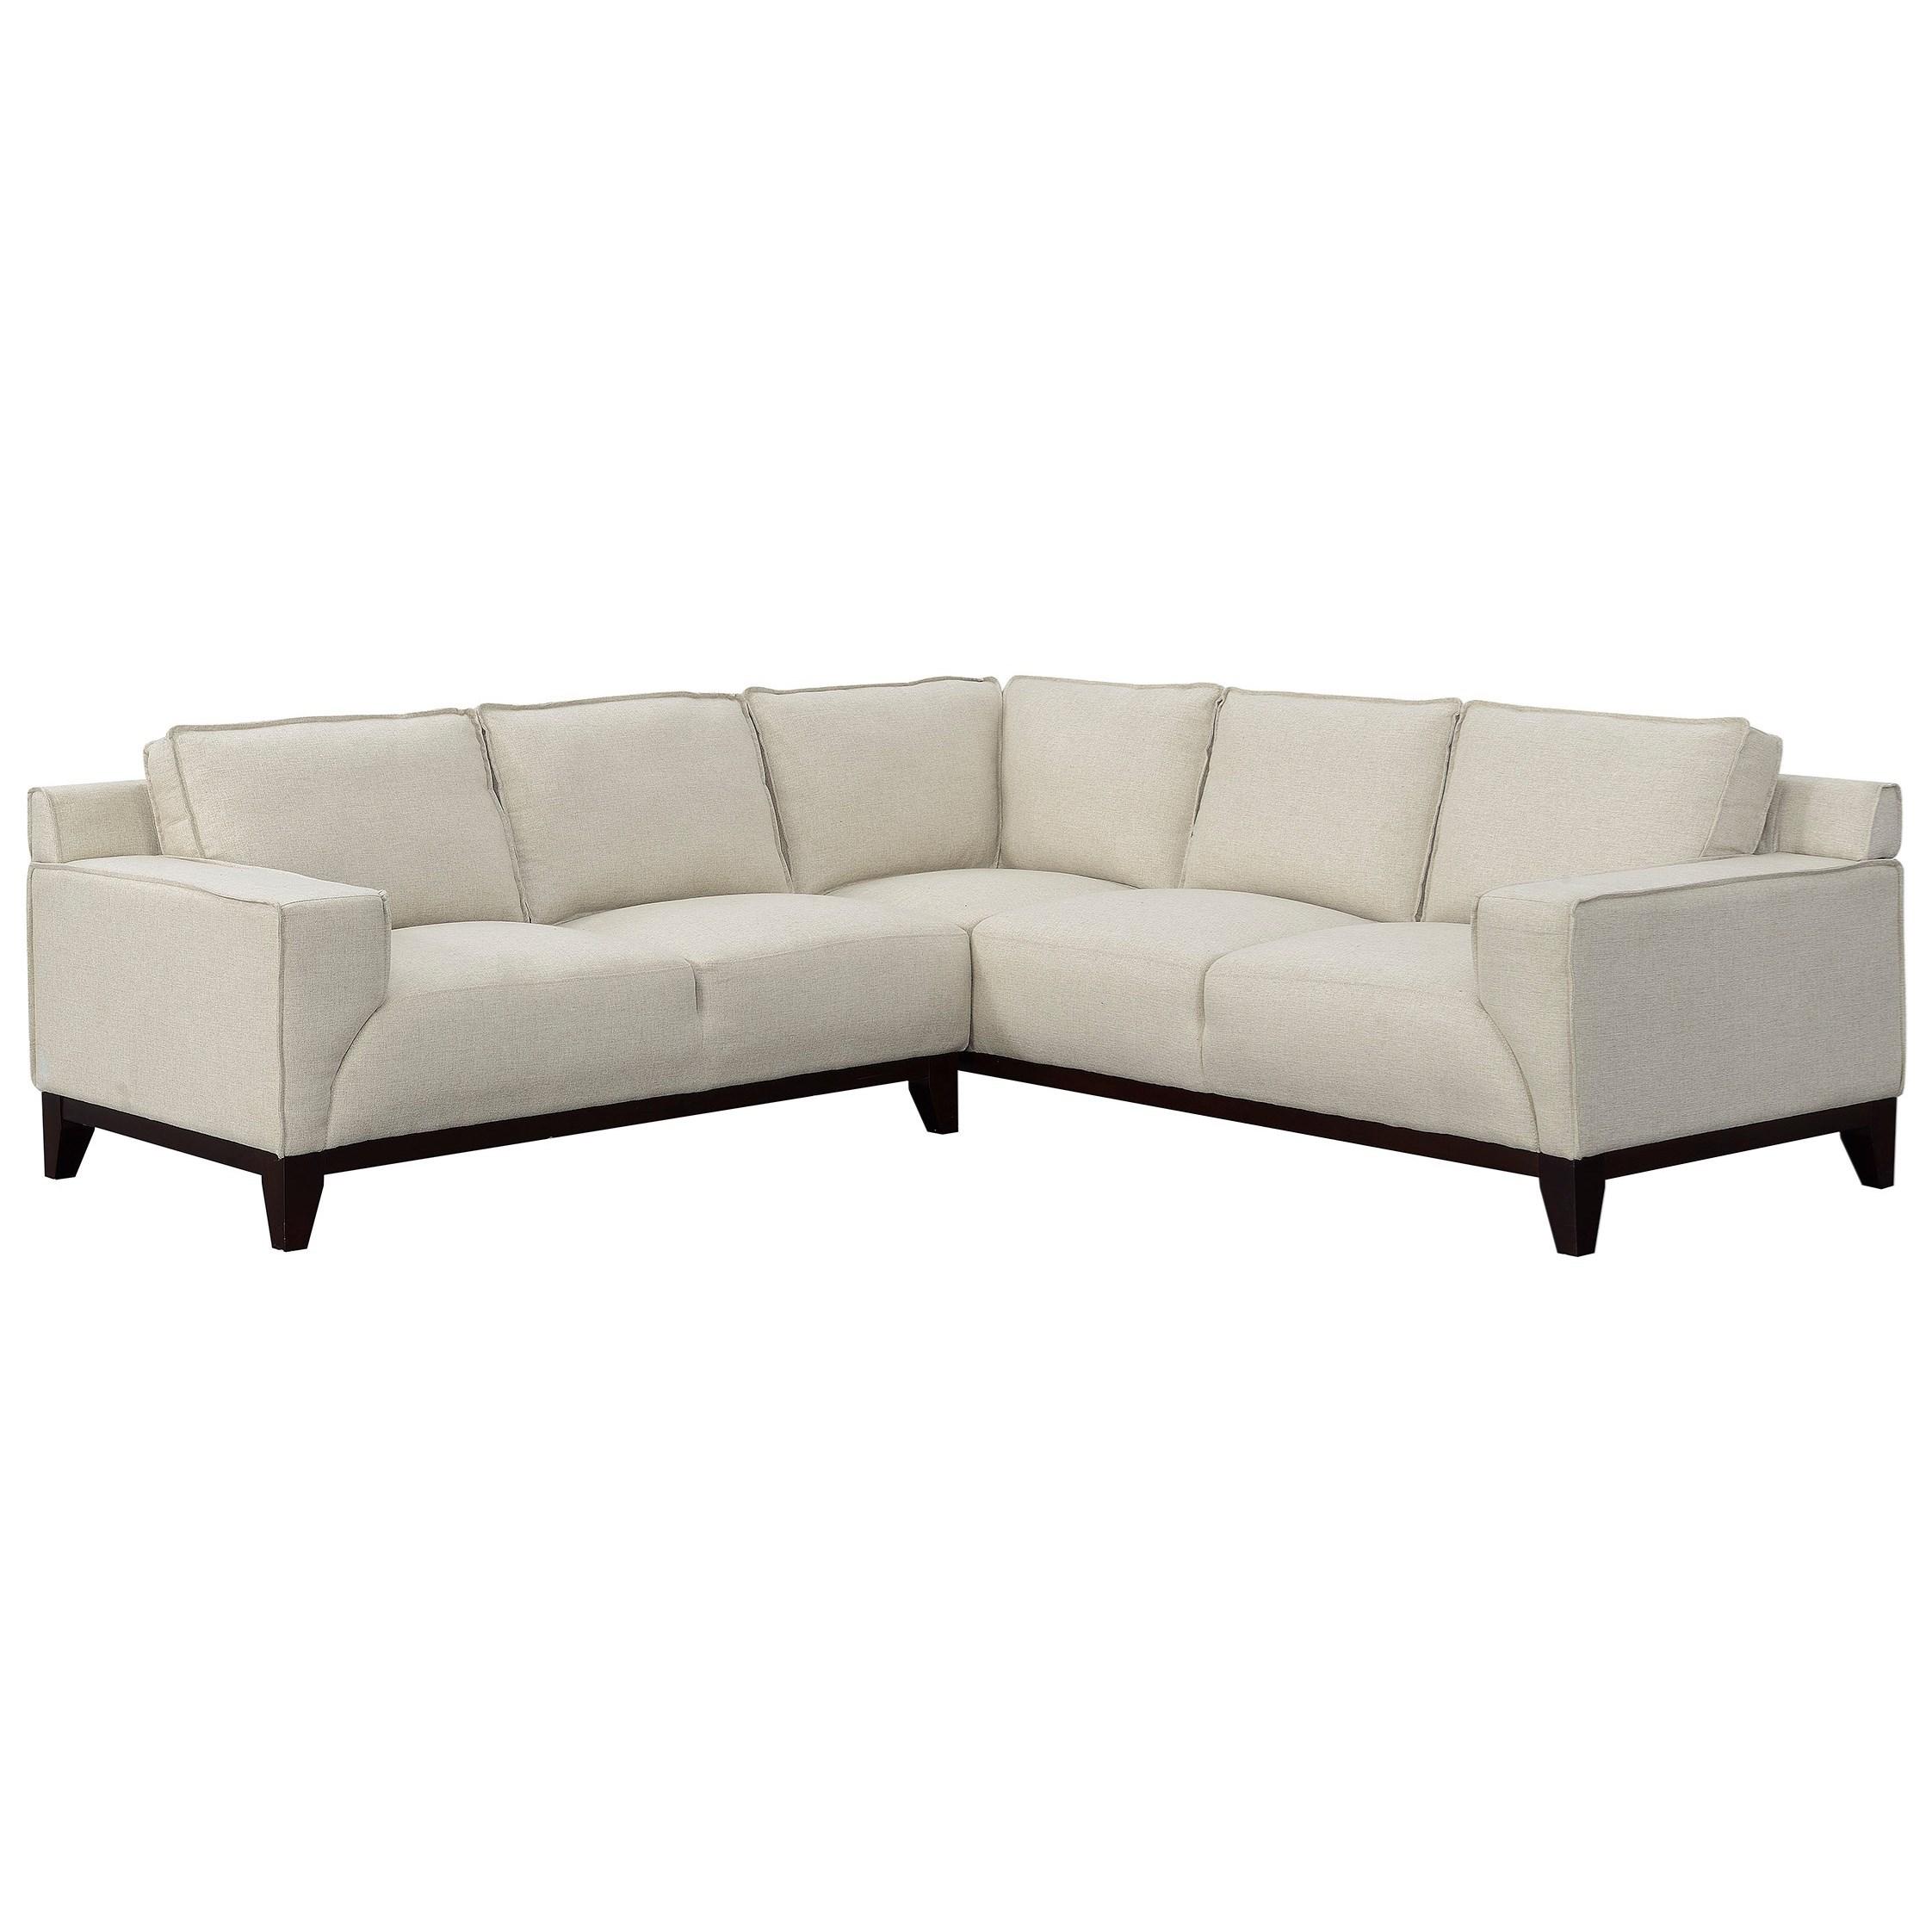 Sectional Sofa Hampton Linen